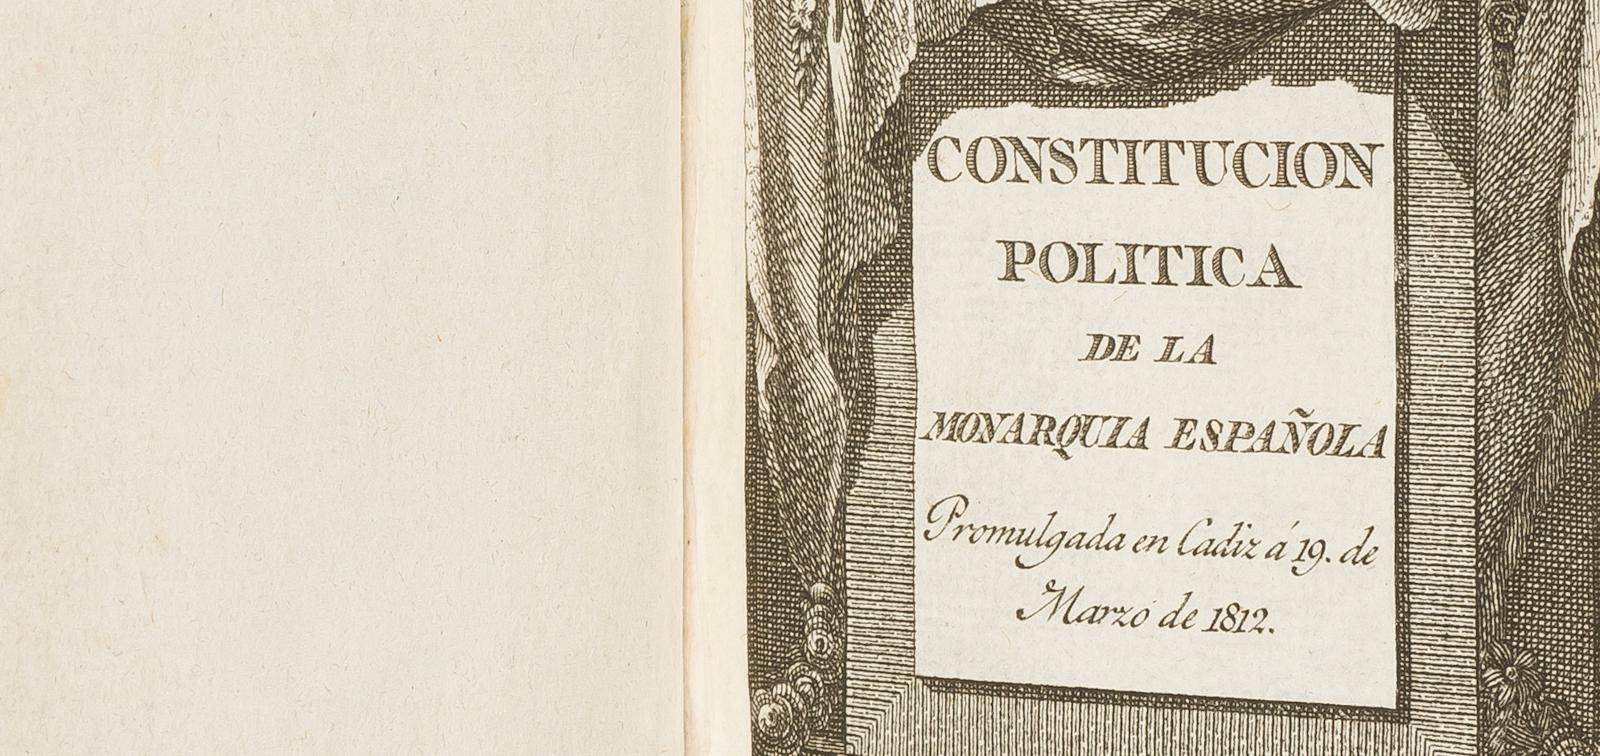 Temporary Installation: Constitutional ideas in Goya's work